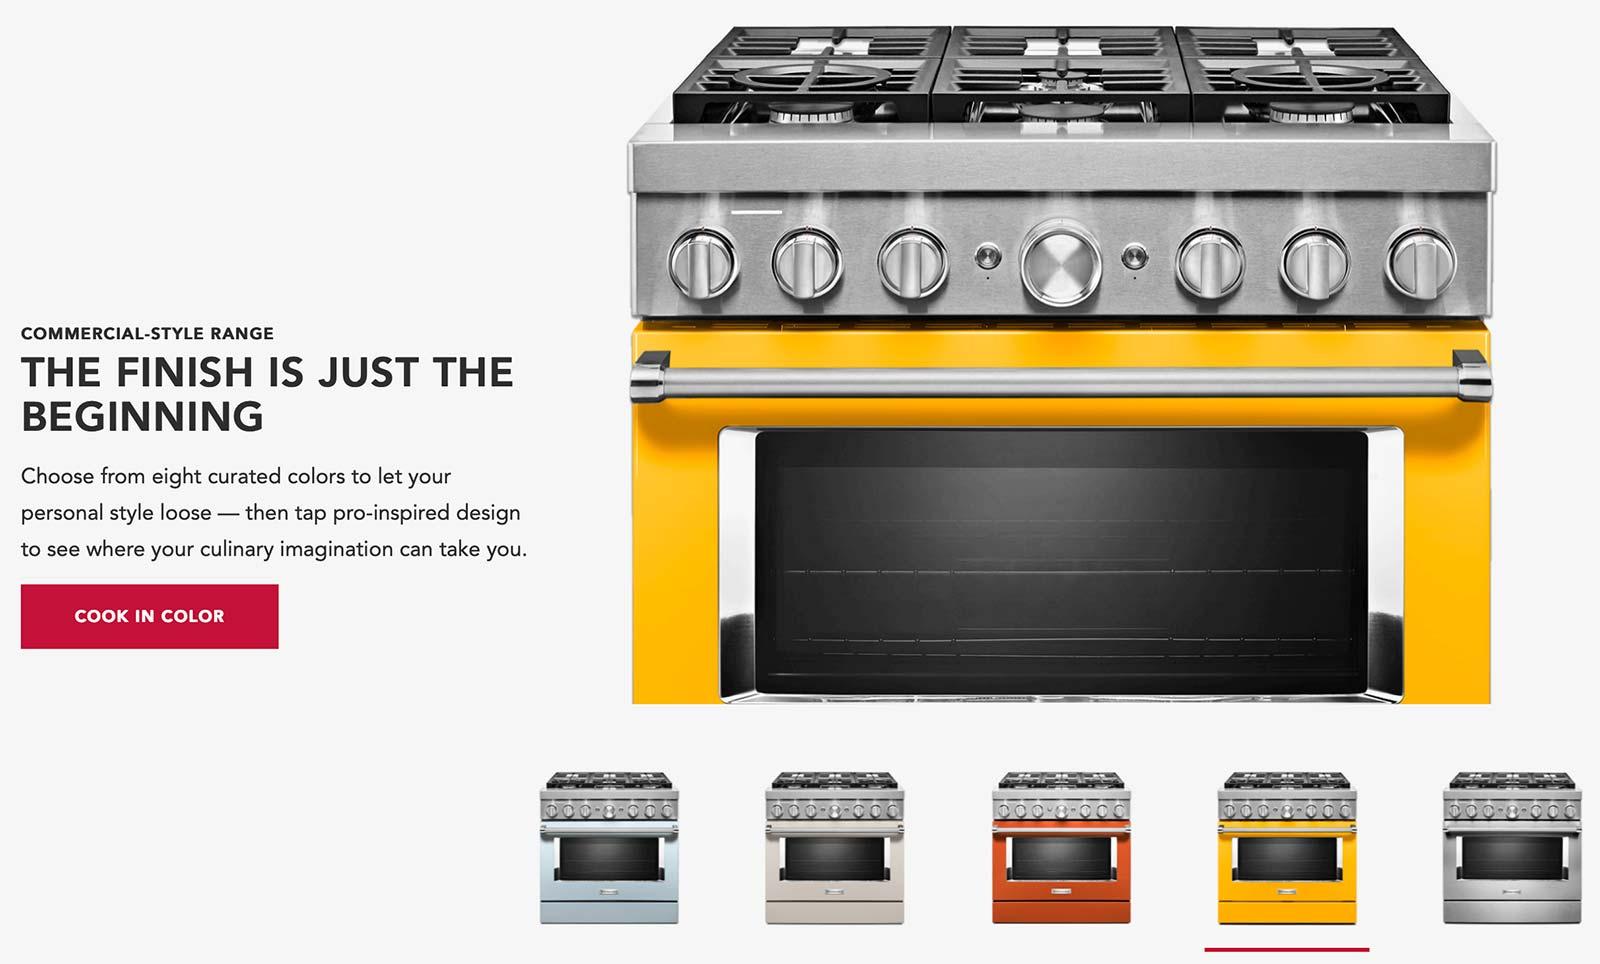 KitchenAid's trending colors, as seen on its major appliances.